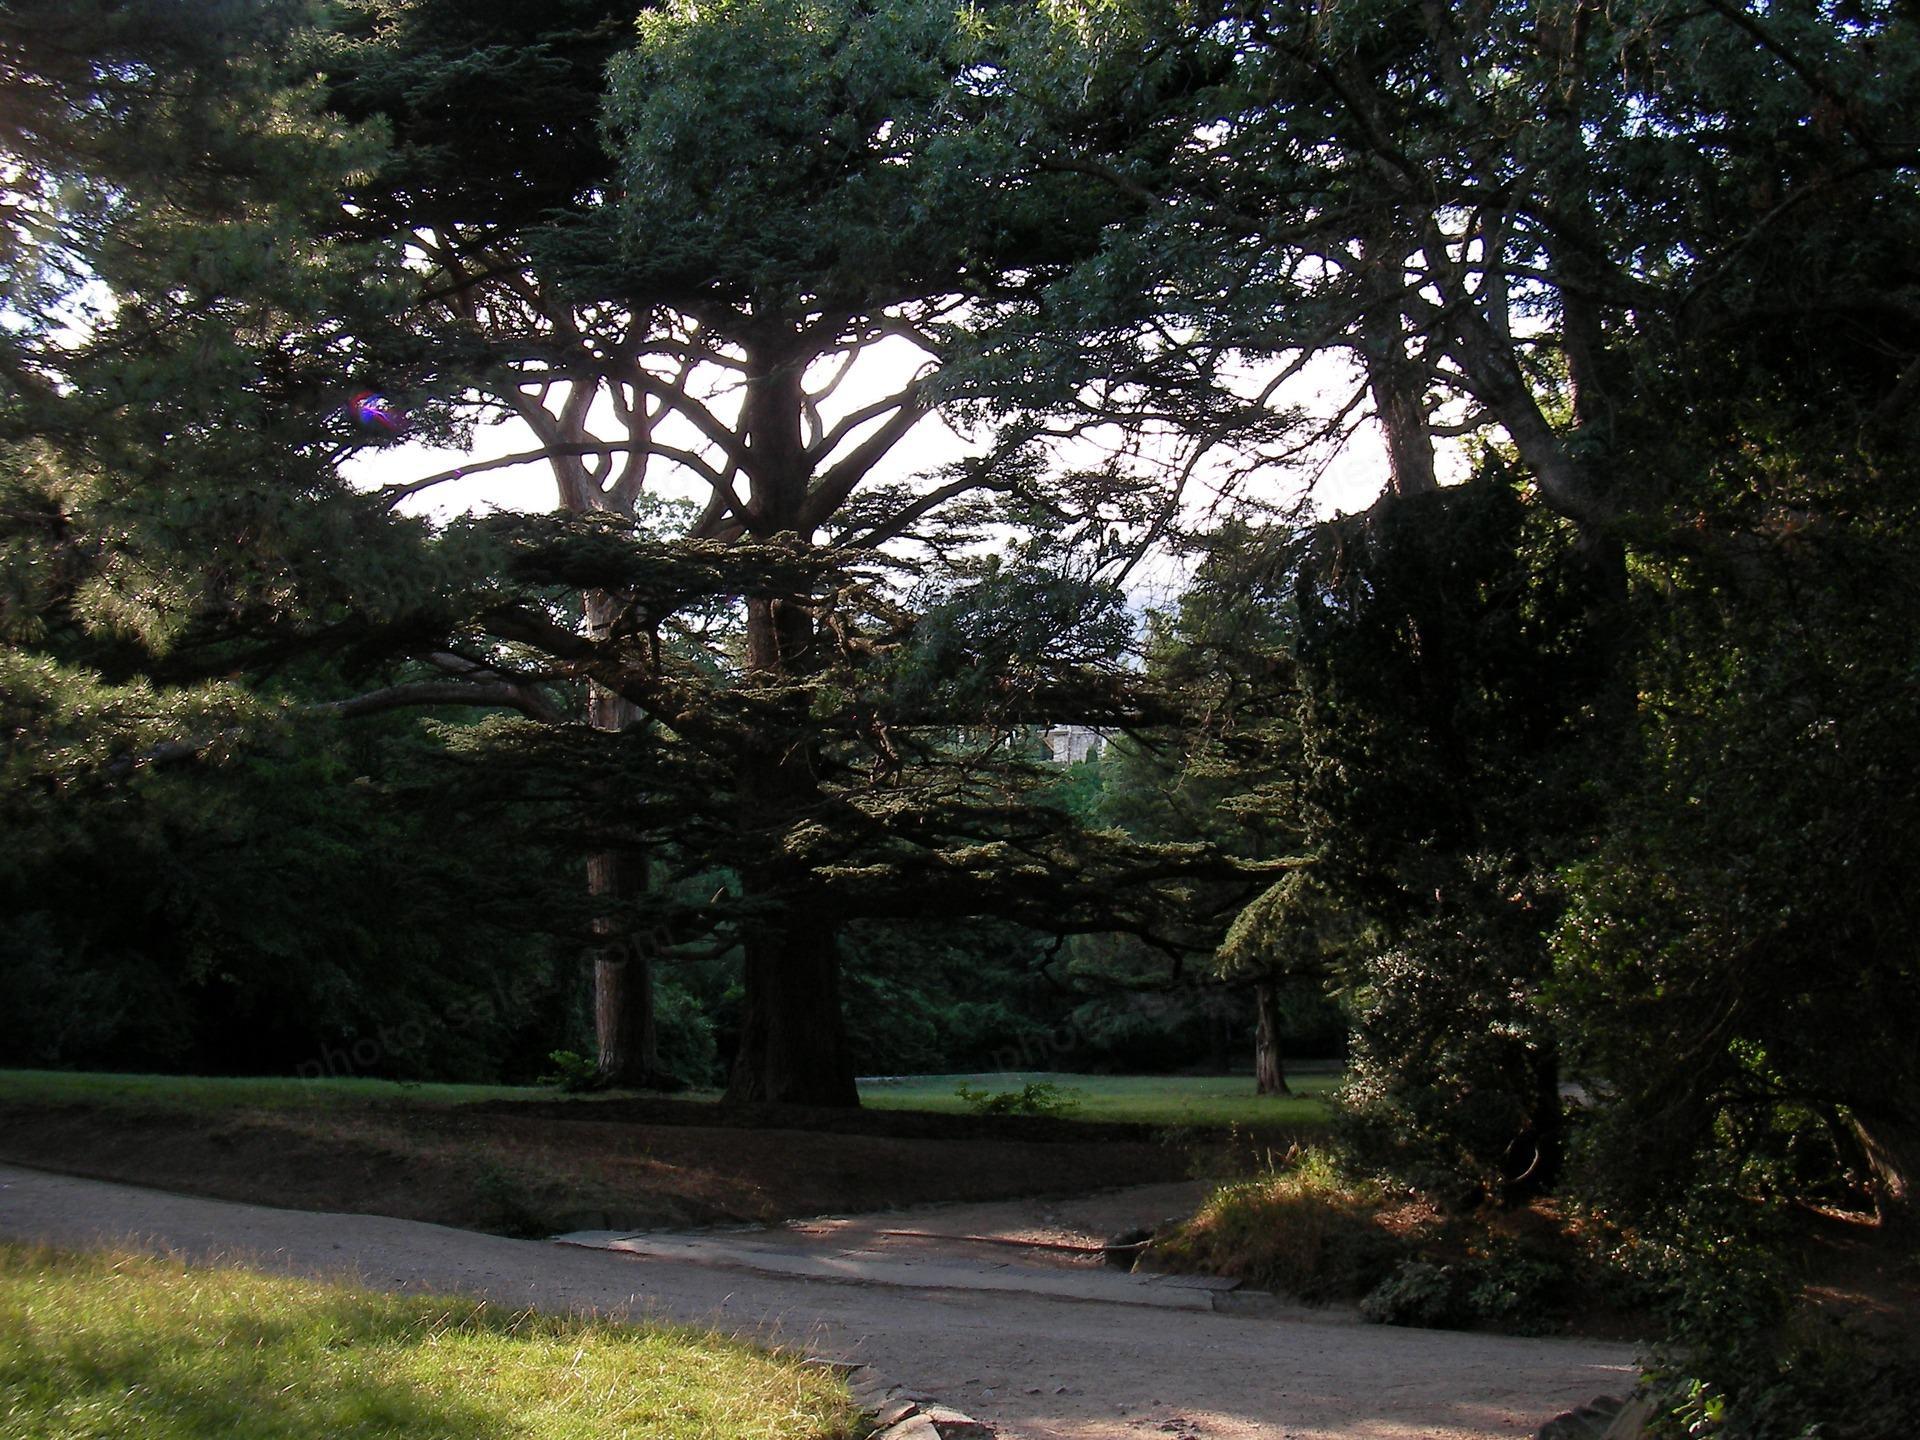 Alupka, Crimea मा Vorontsov पार्क